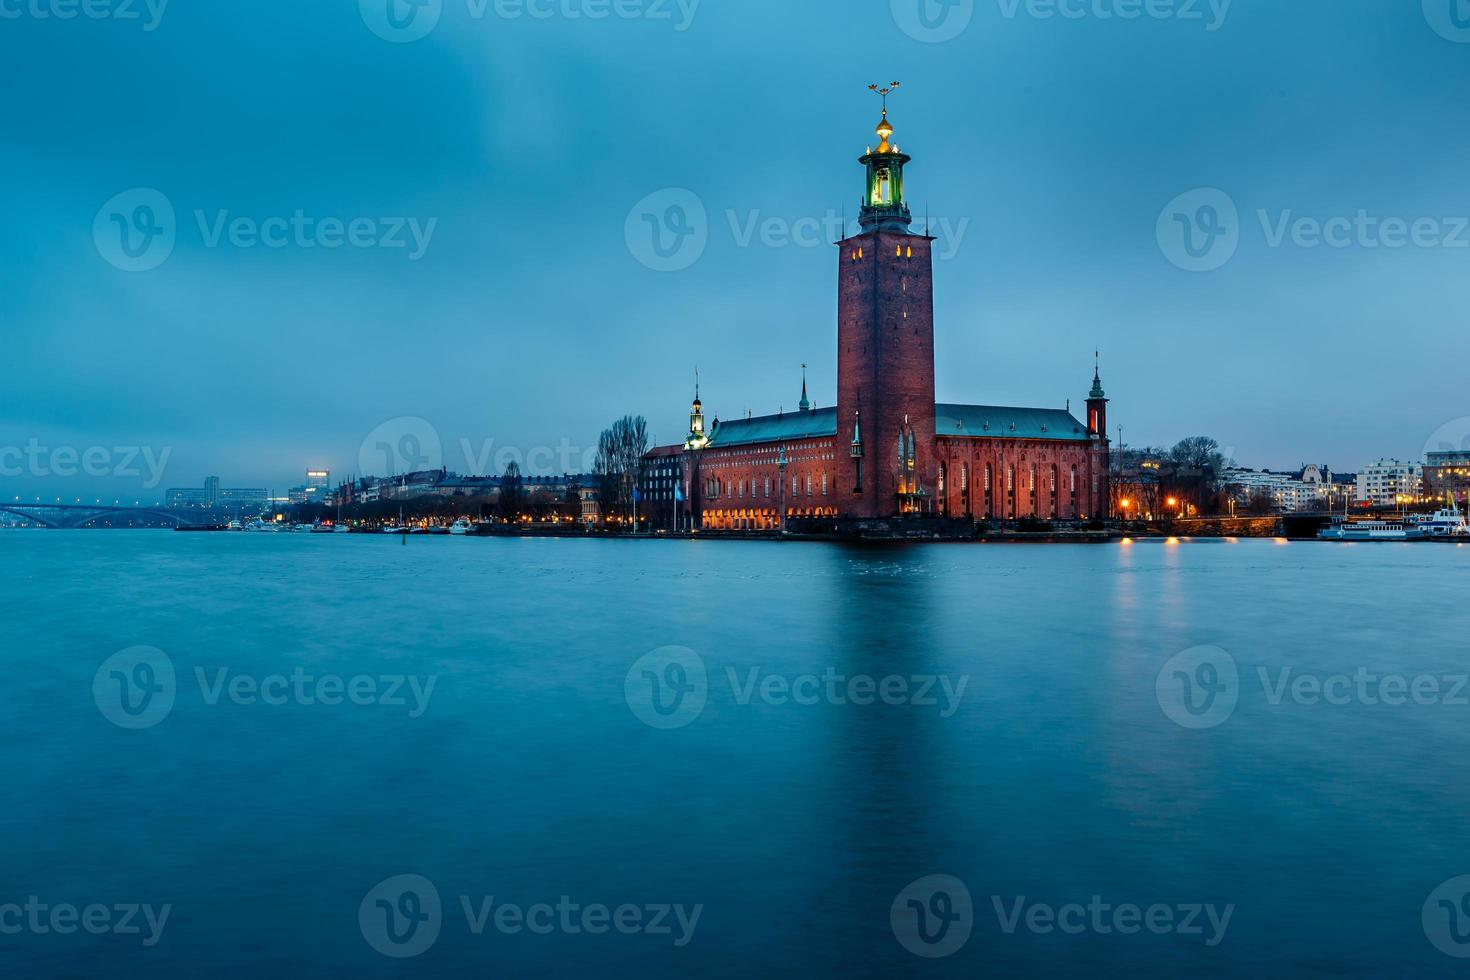 stockholm cityhall gelegen op kungsholmen-eiland in de ochtend foto